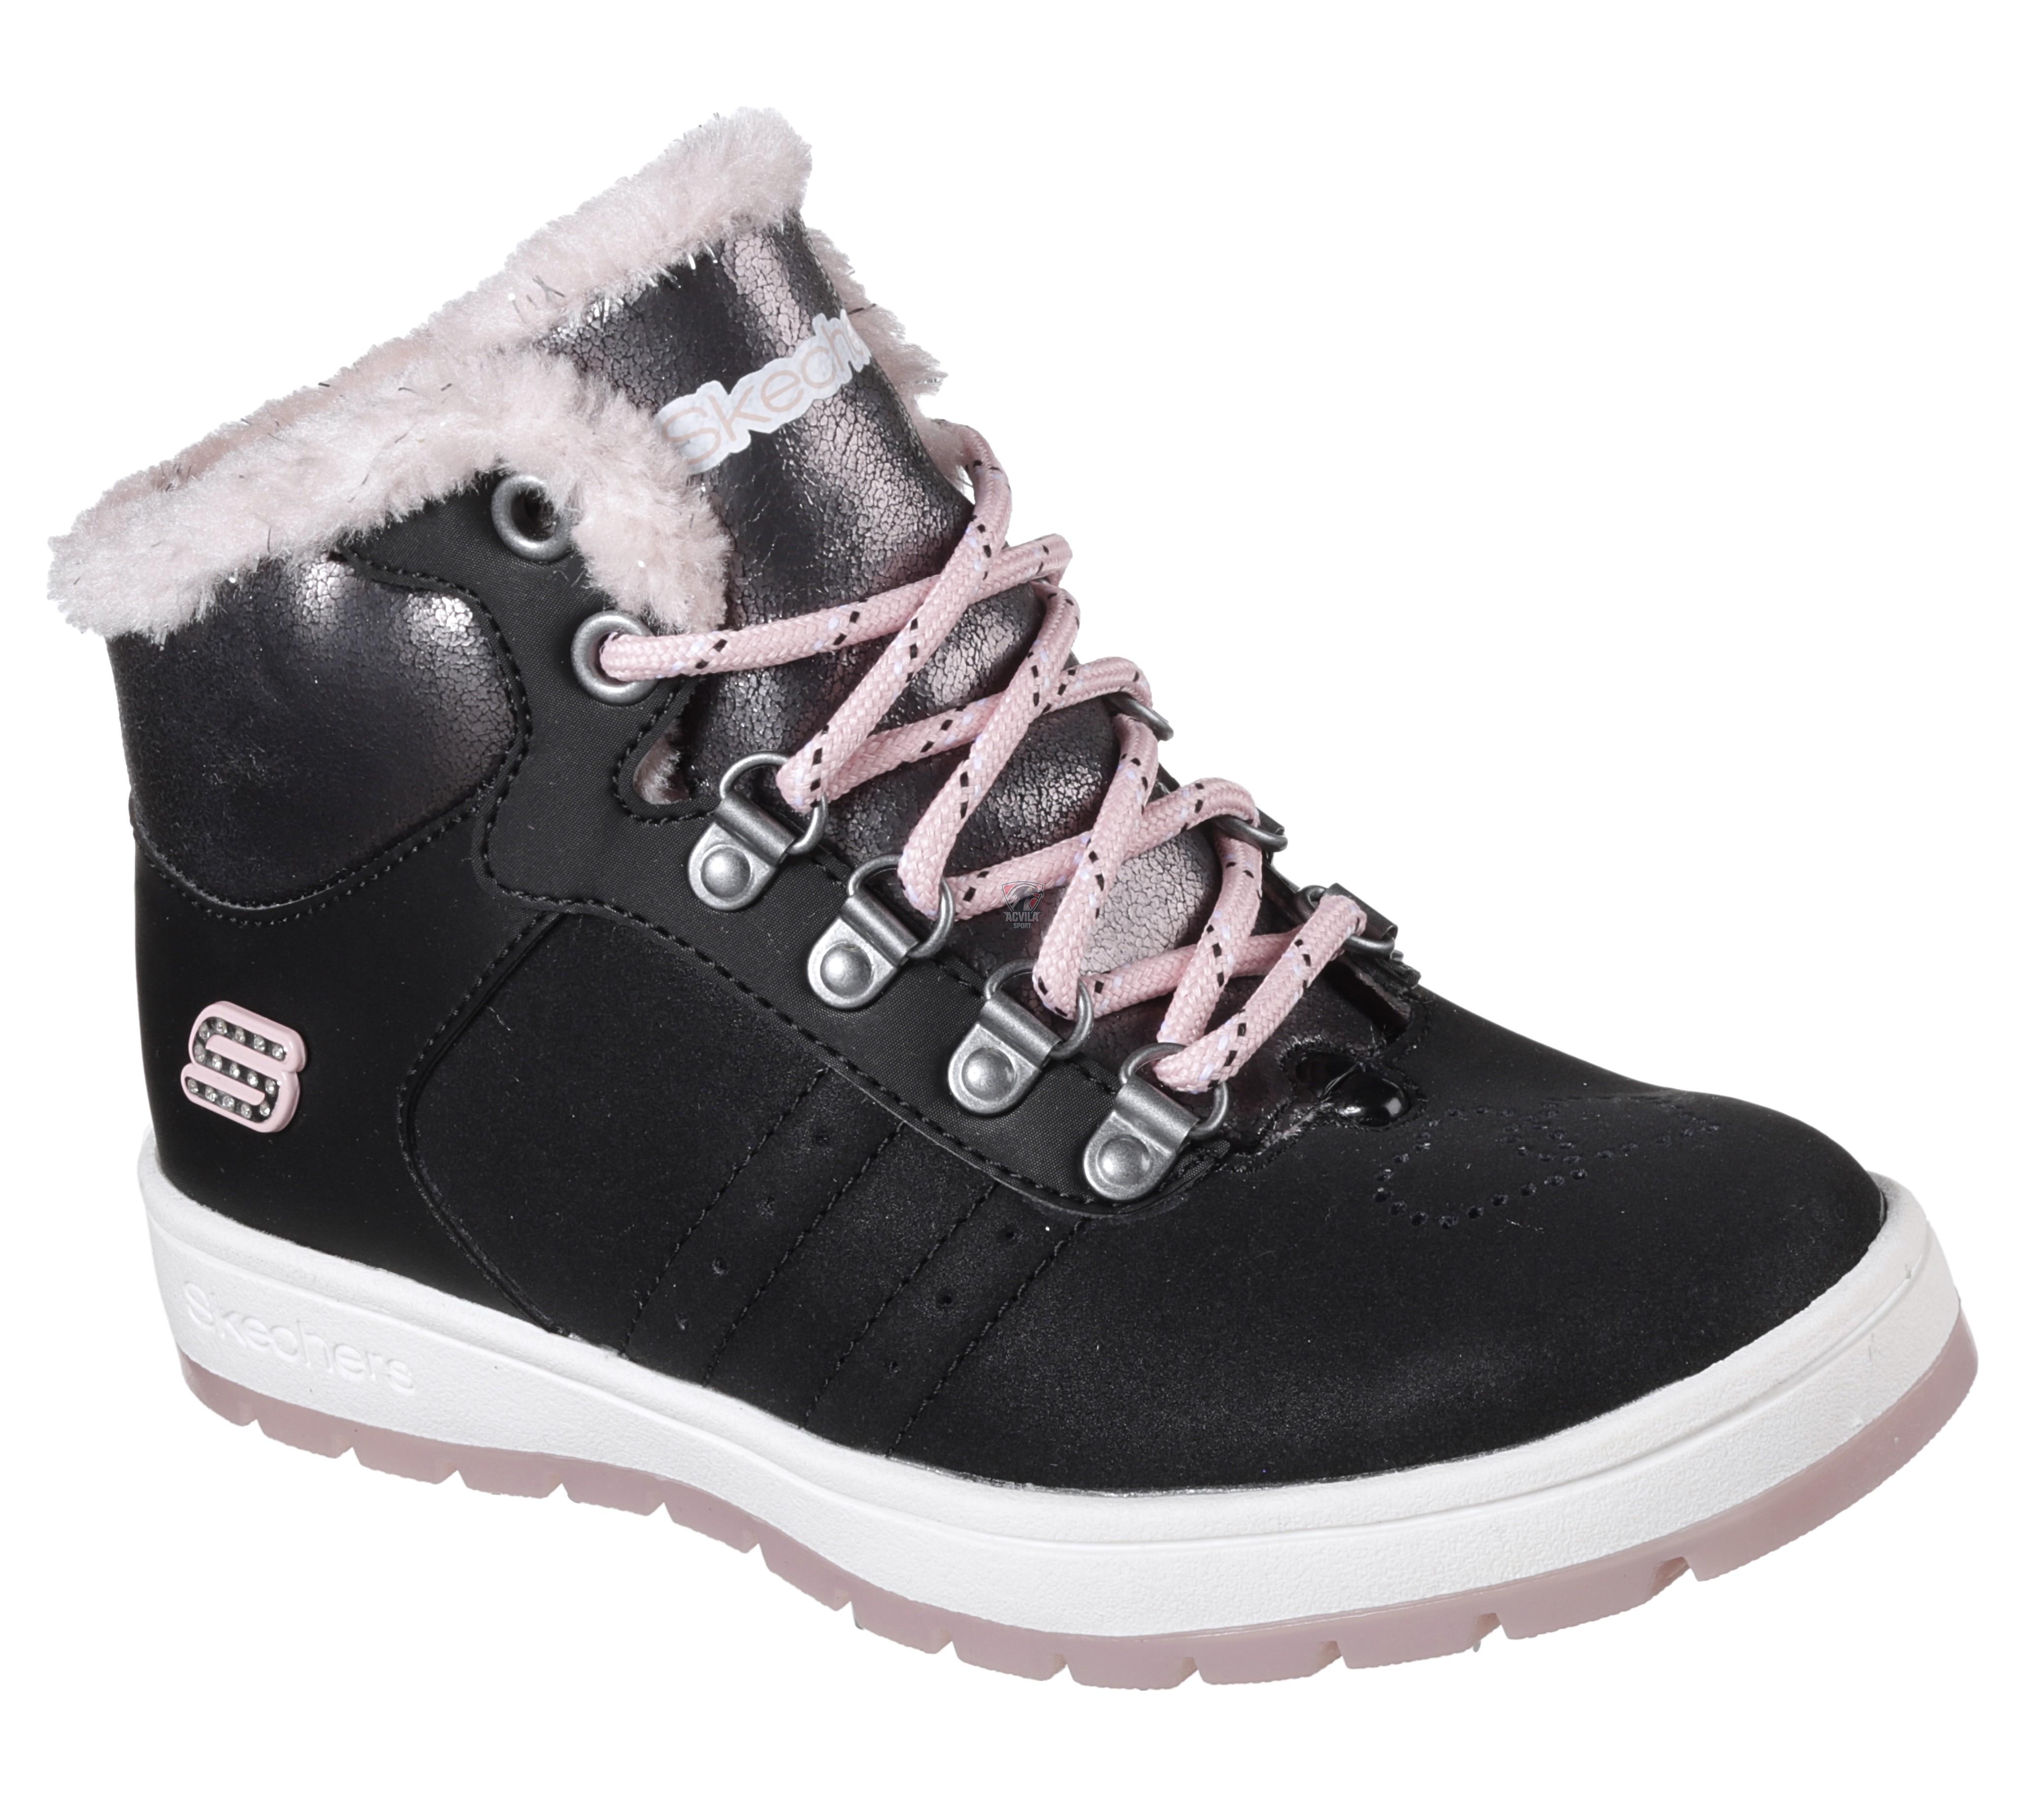 Photo acvilasport - Детская обувь SKECHERS STREET CLEAT 2.0-TRICKSTAR